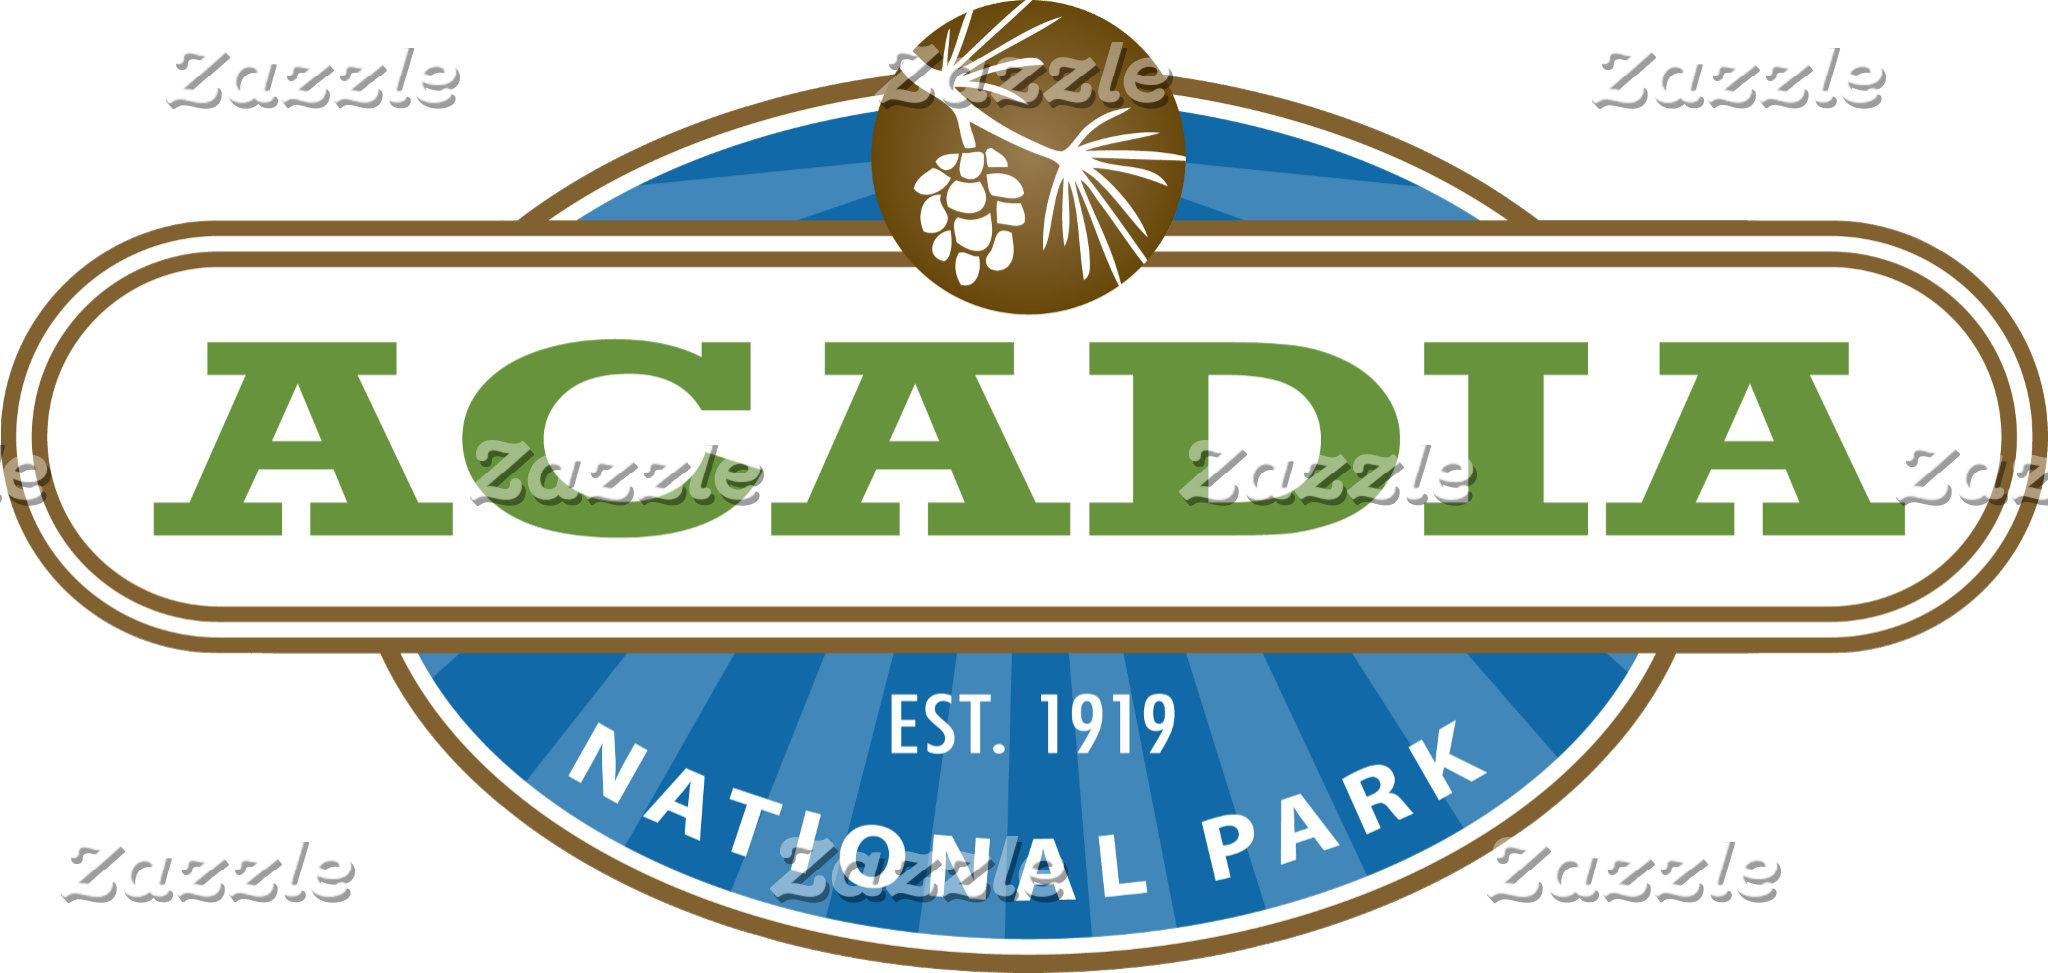 New National Park Designs